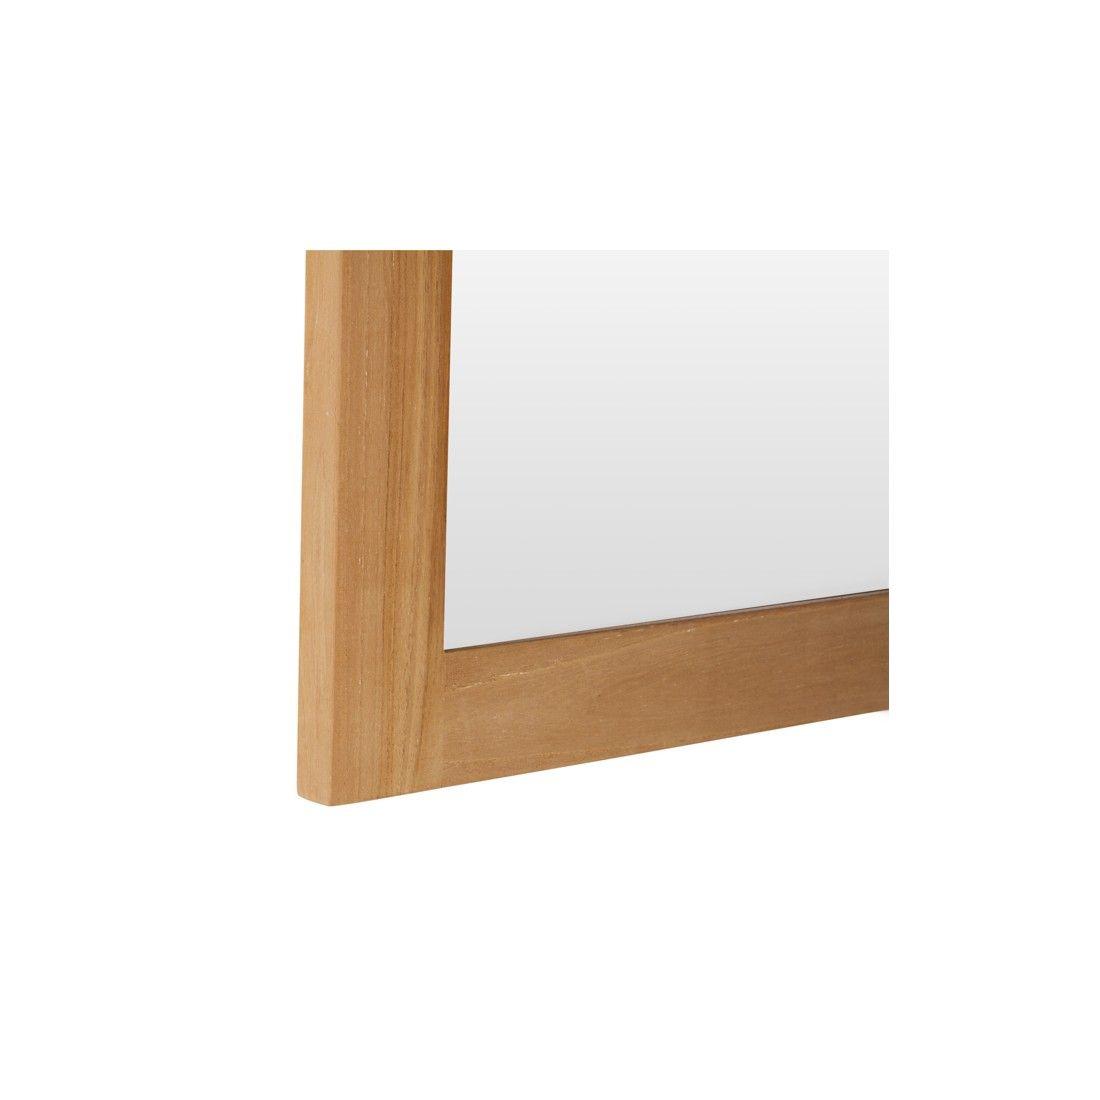 Miroir en teck massif brut by Line Art